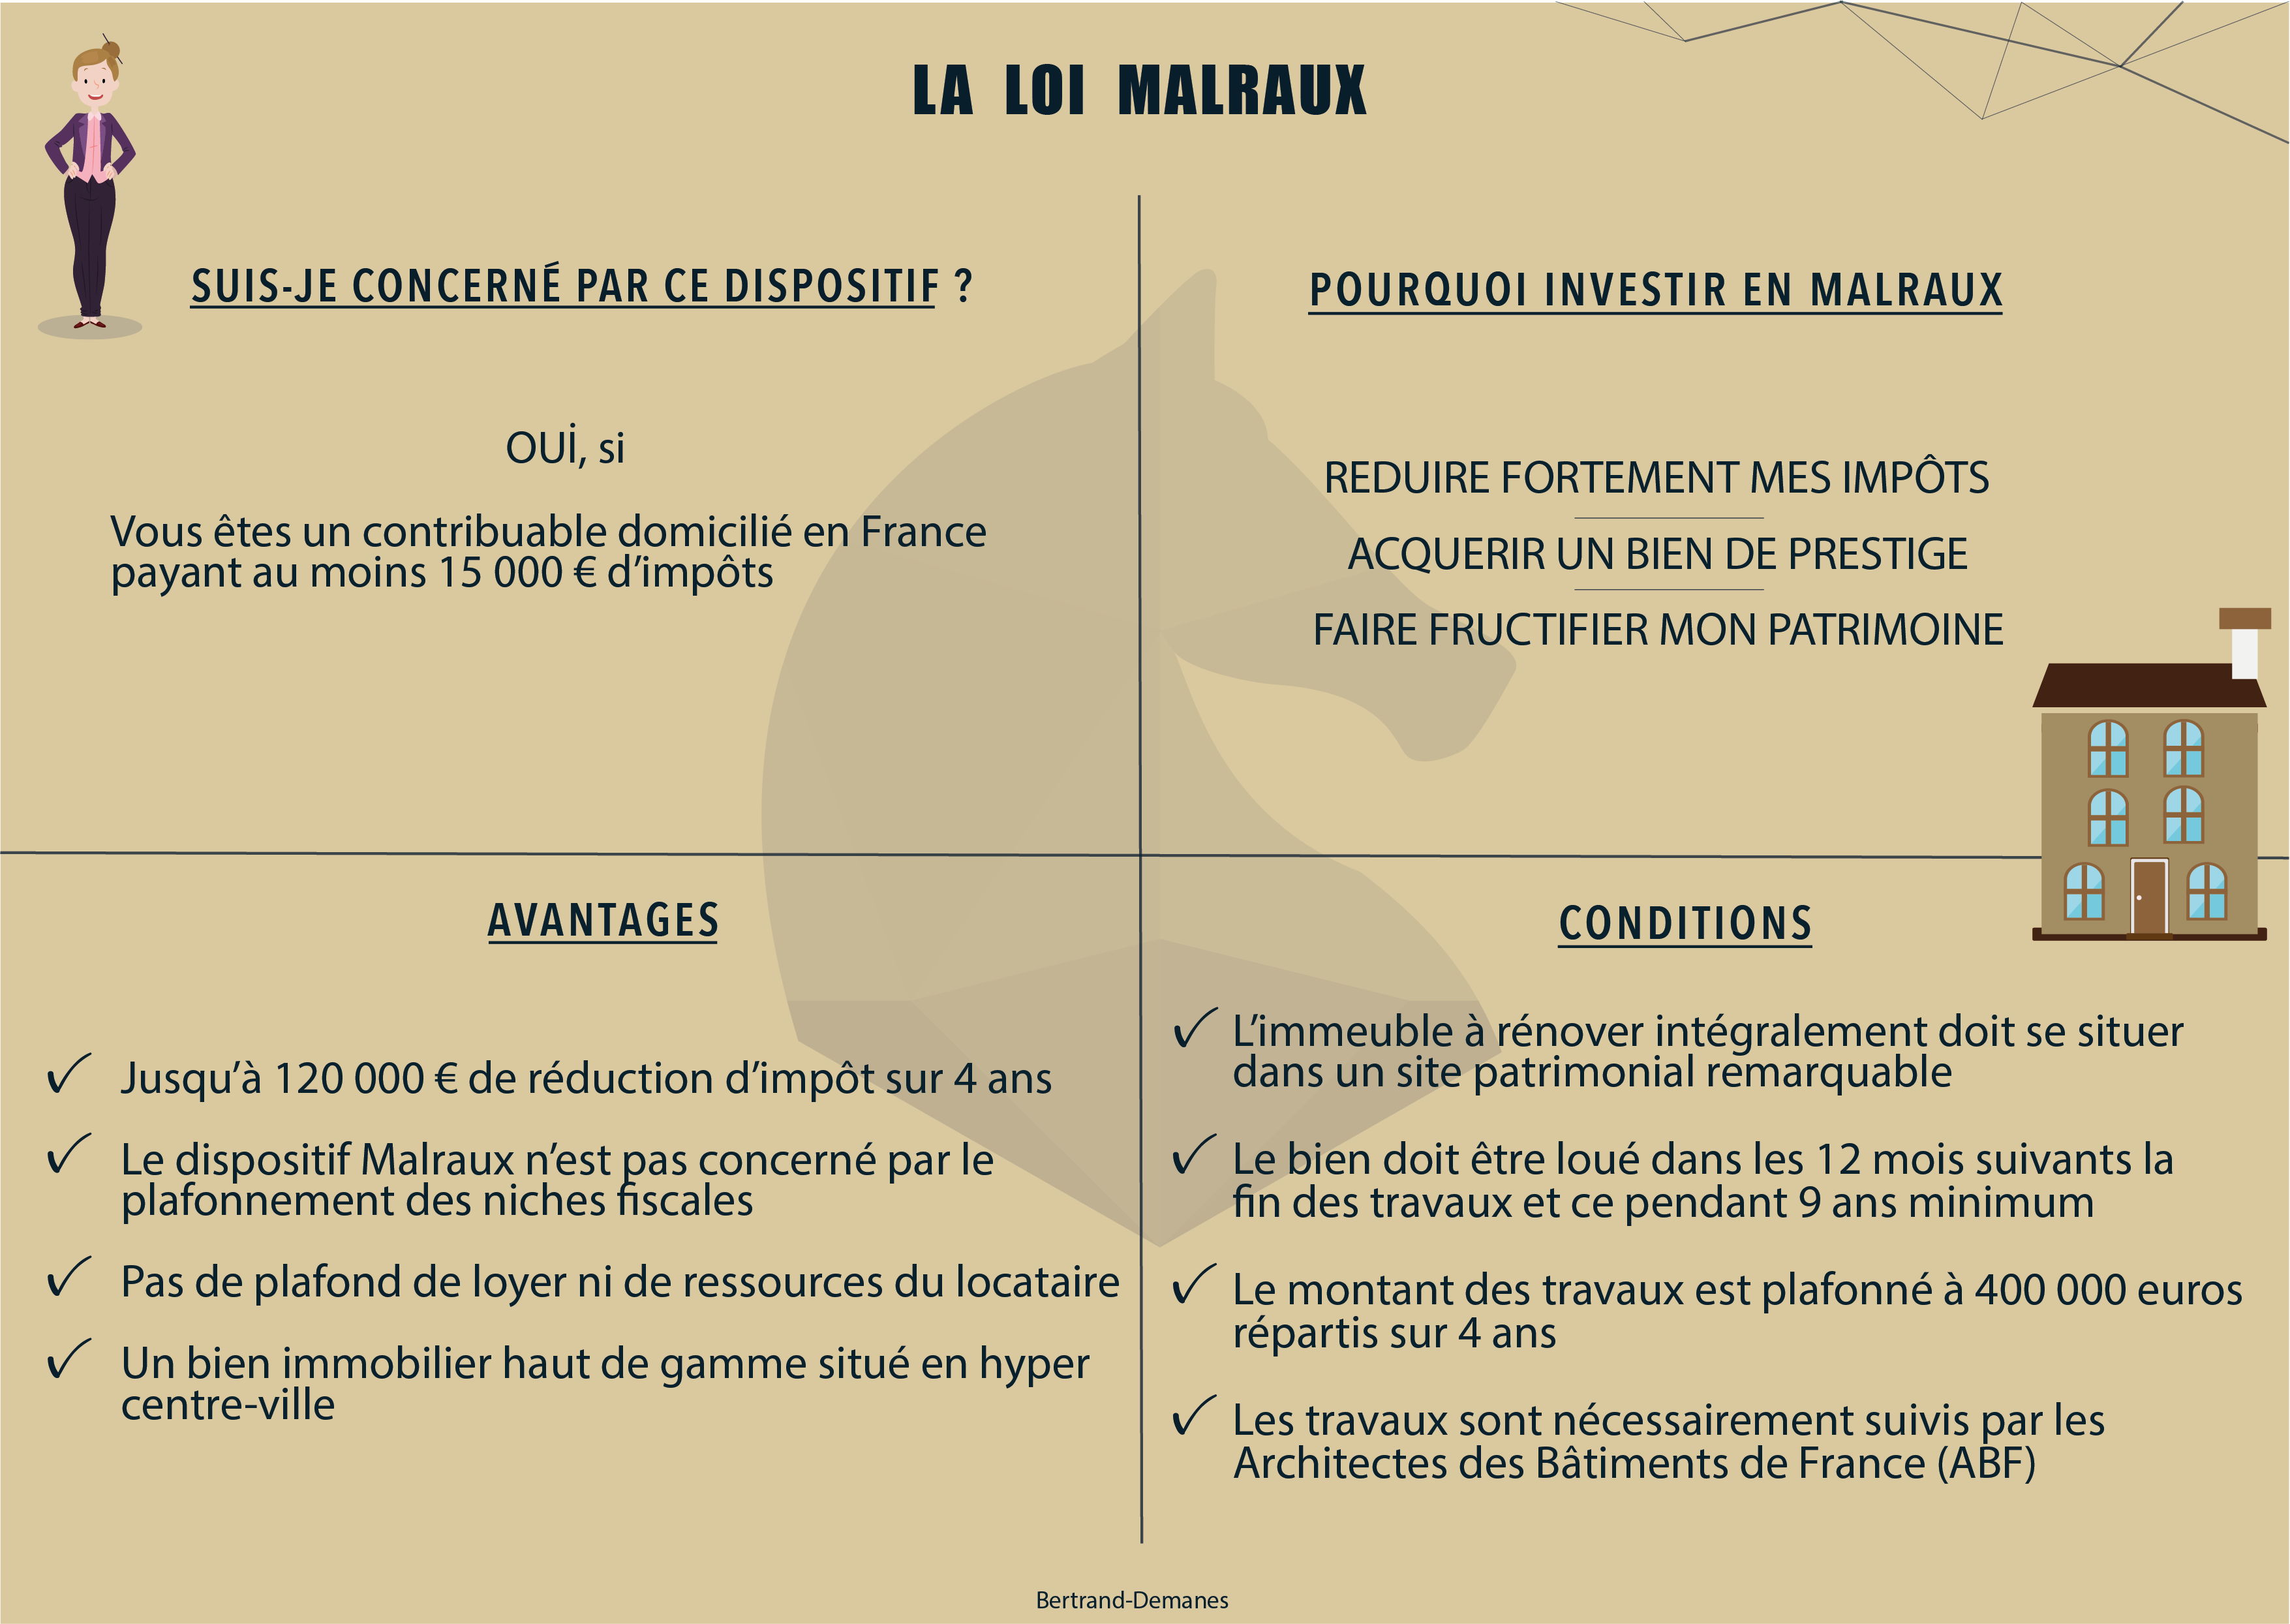 infographie-loi-malraux-nantes-bertrand-demanes